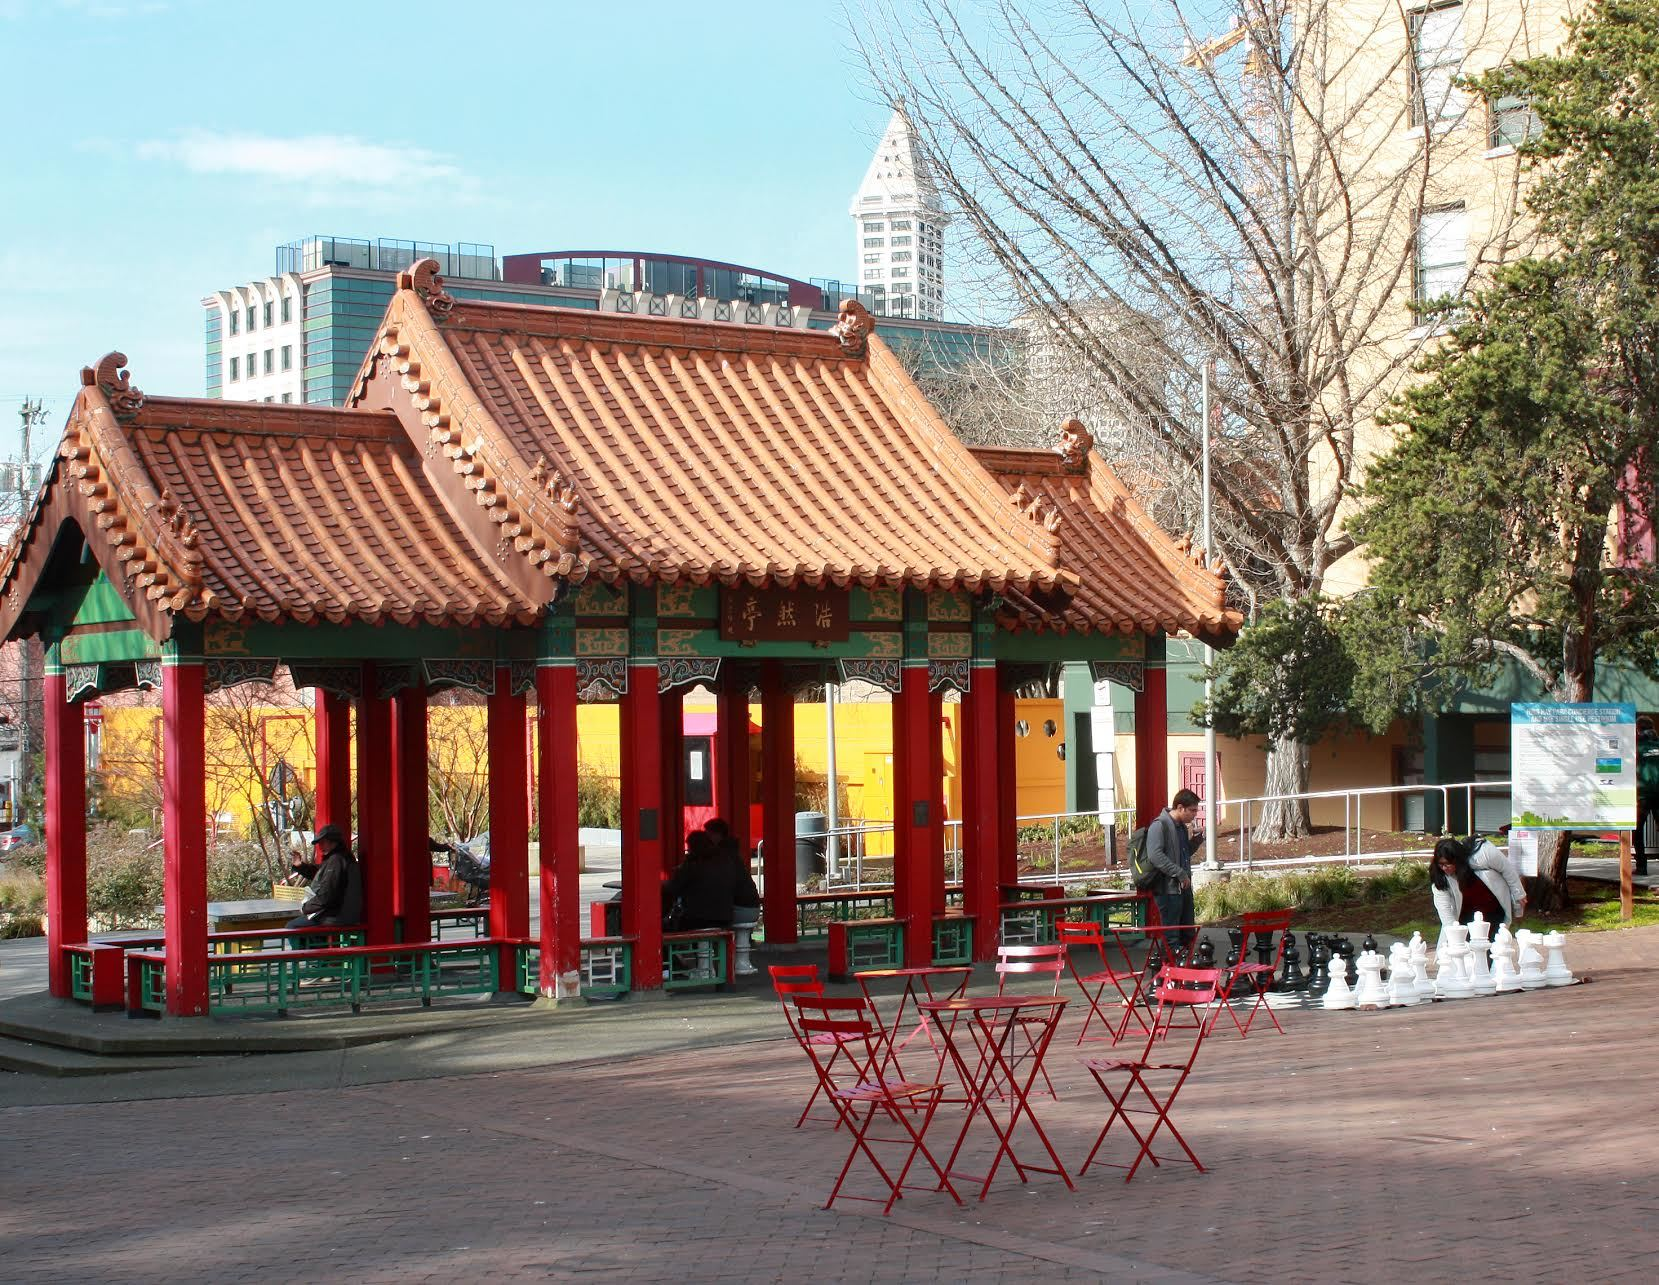 Seattle Chinatown-International District